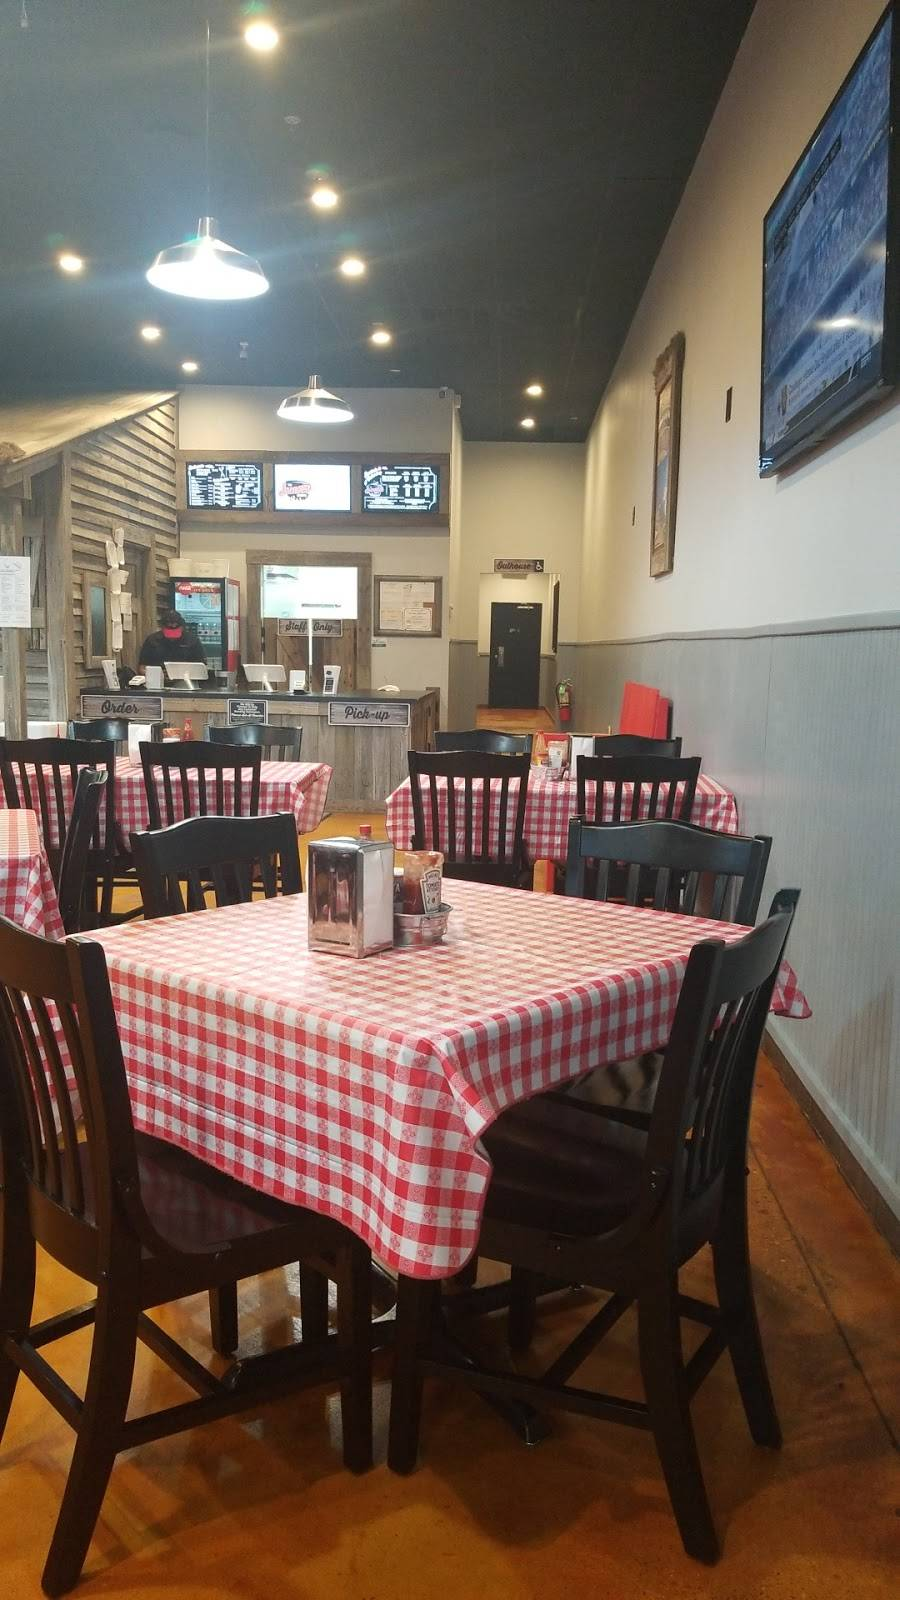 The Jambalaya Shoppe - Laplace   restaurant   150 Belle Terre Blvd STE F, Laplace, LA 70068, USA   9853595747 OR +1 985-359-5747